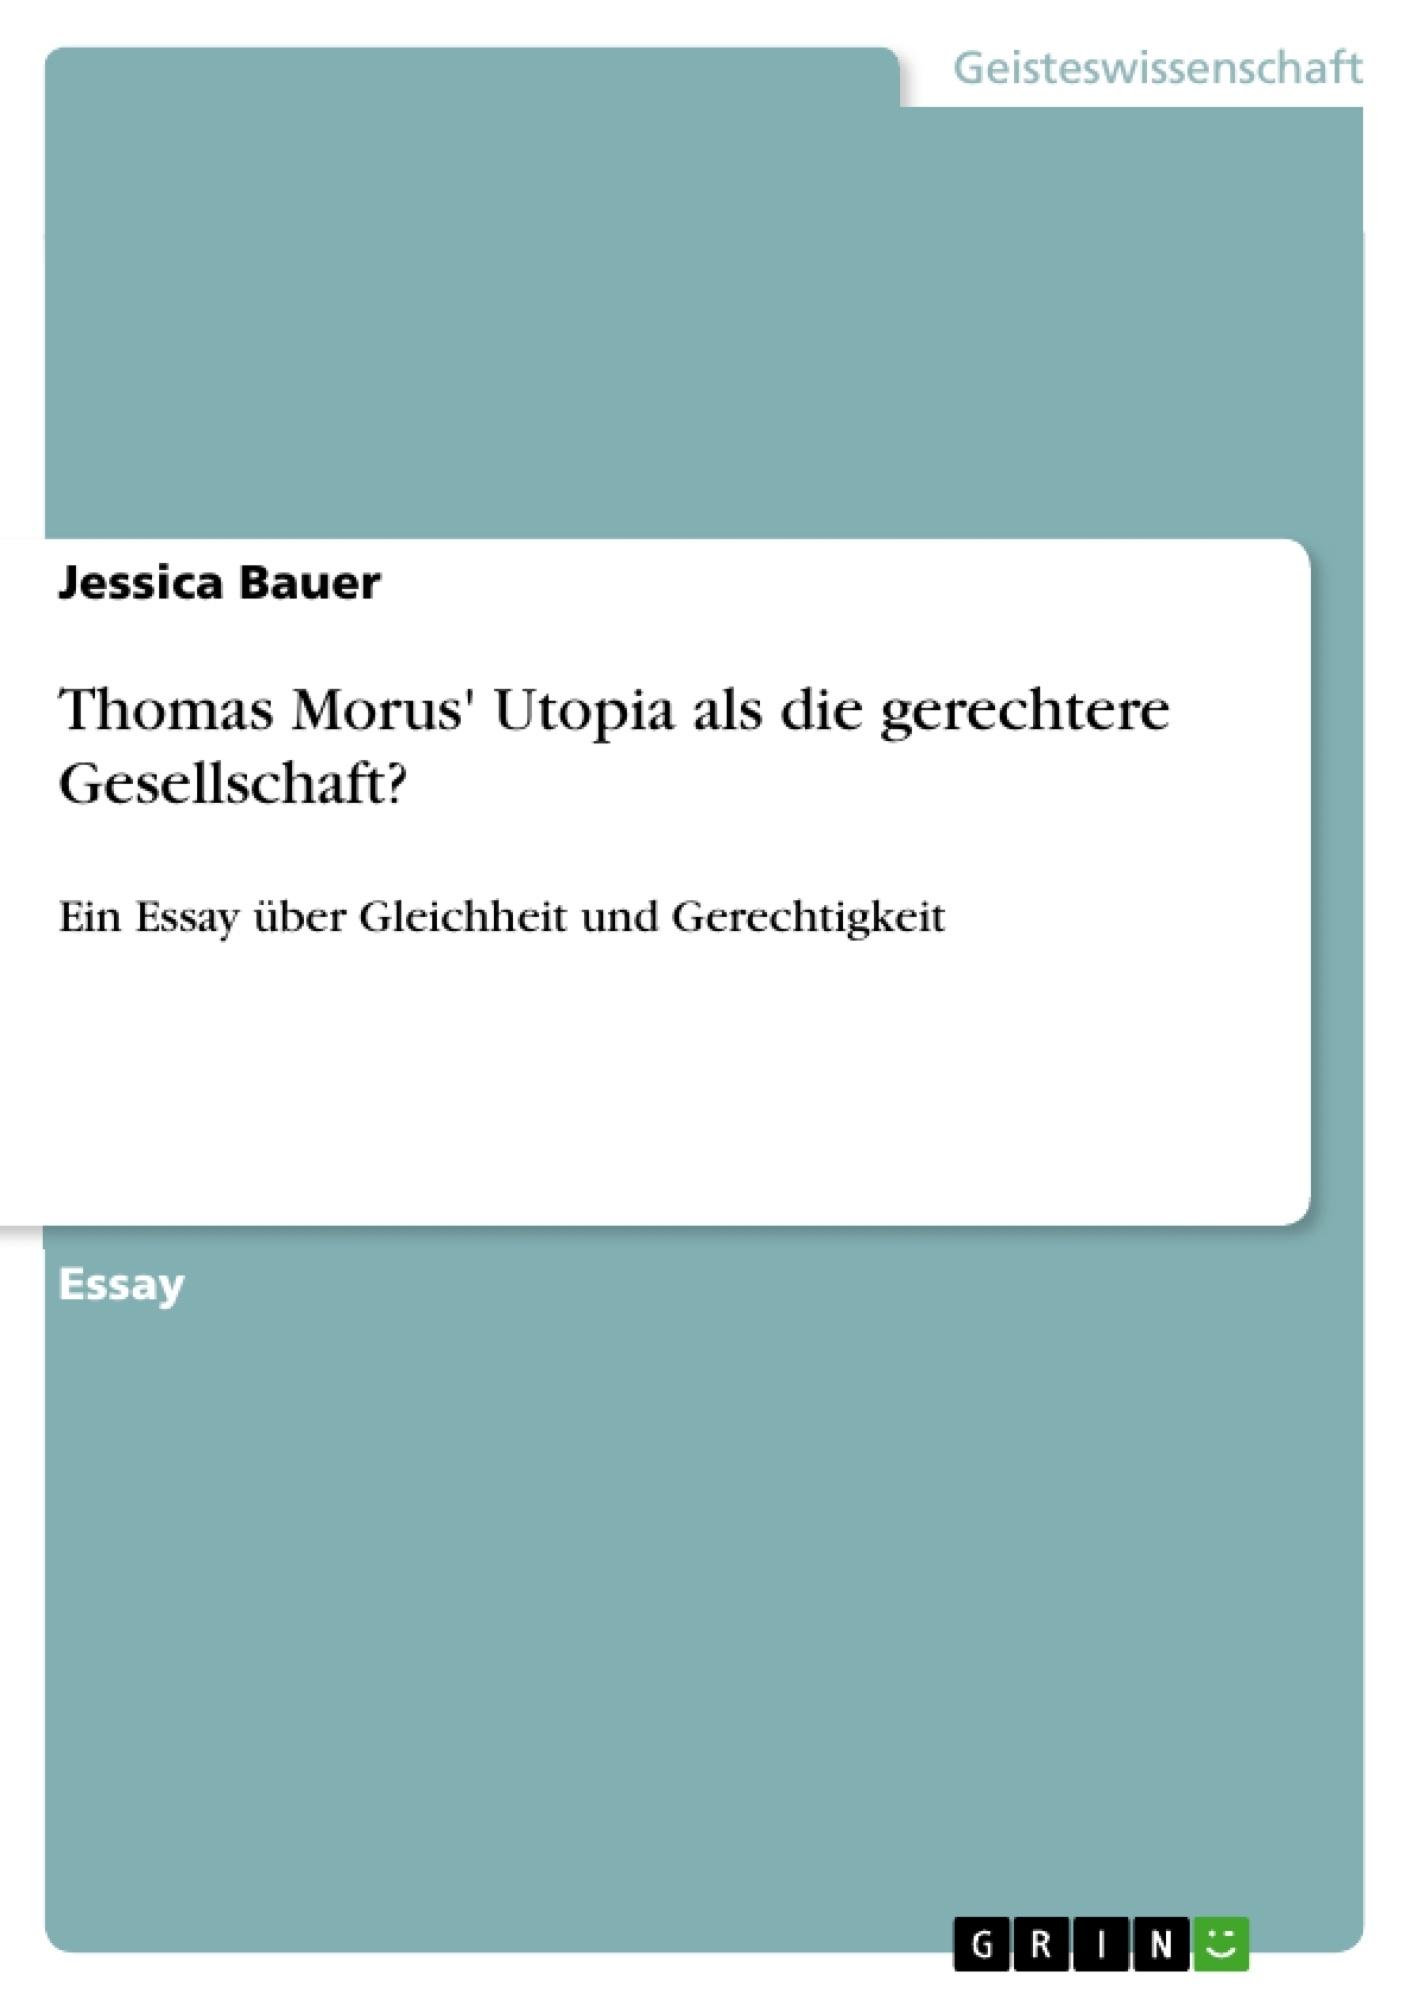 Titel: Thomas Morus' Utopia als die gerechtere Gesellschaft?